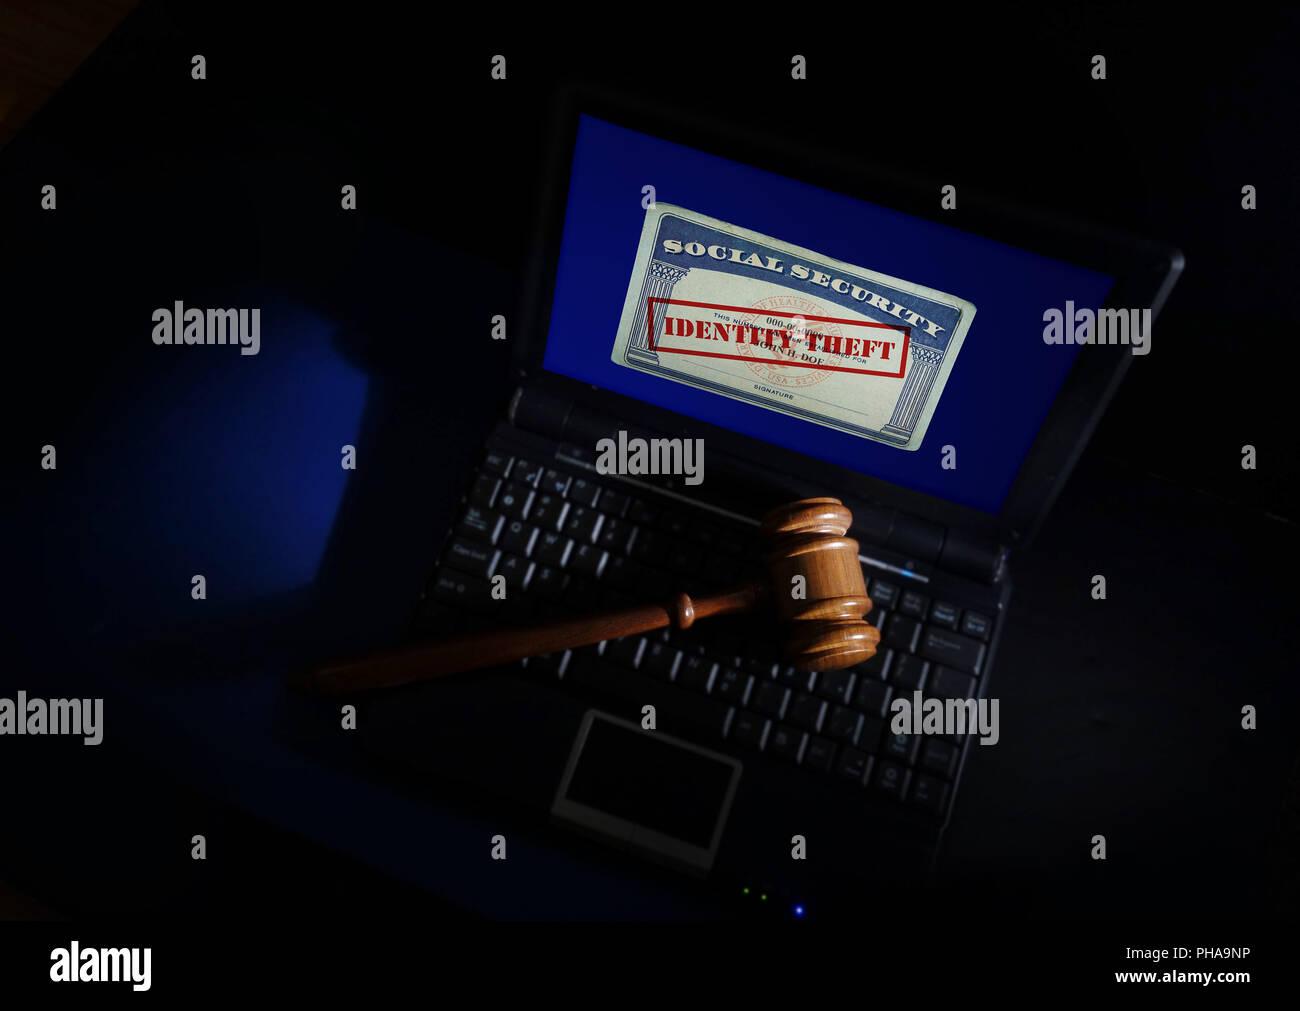 Gavel on Identity Theft card - Stock Image